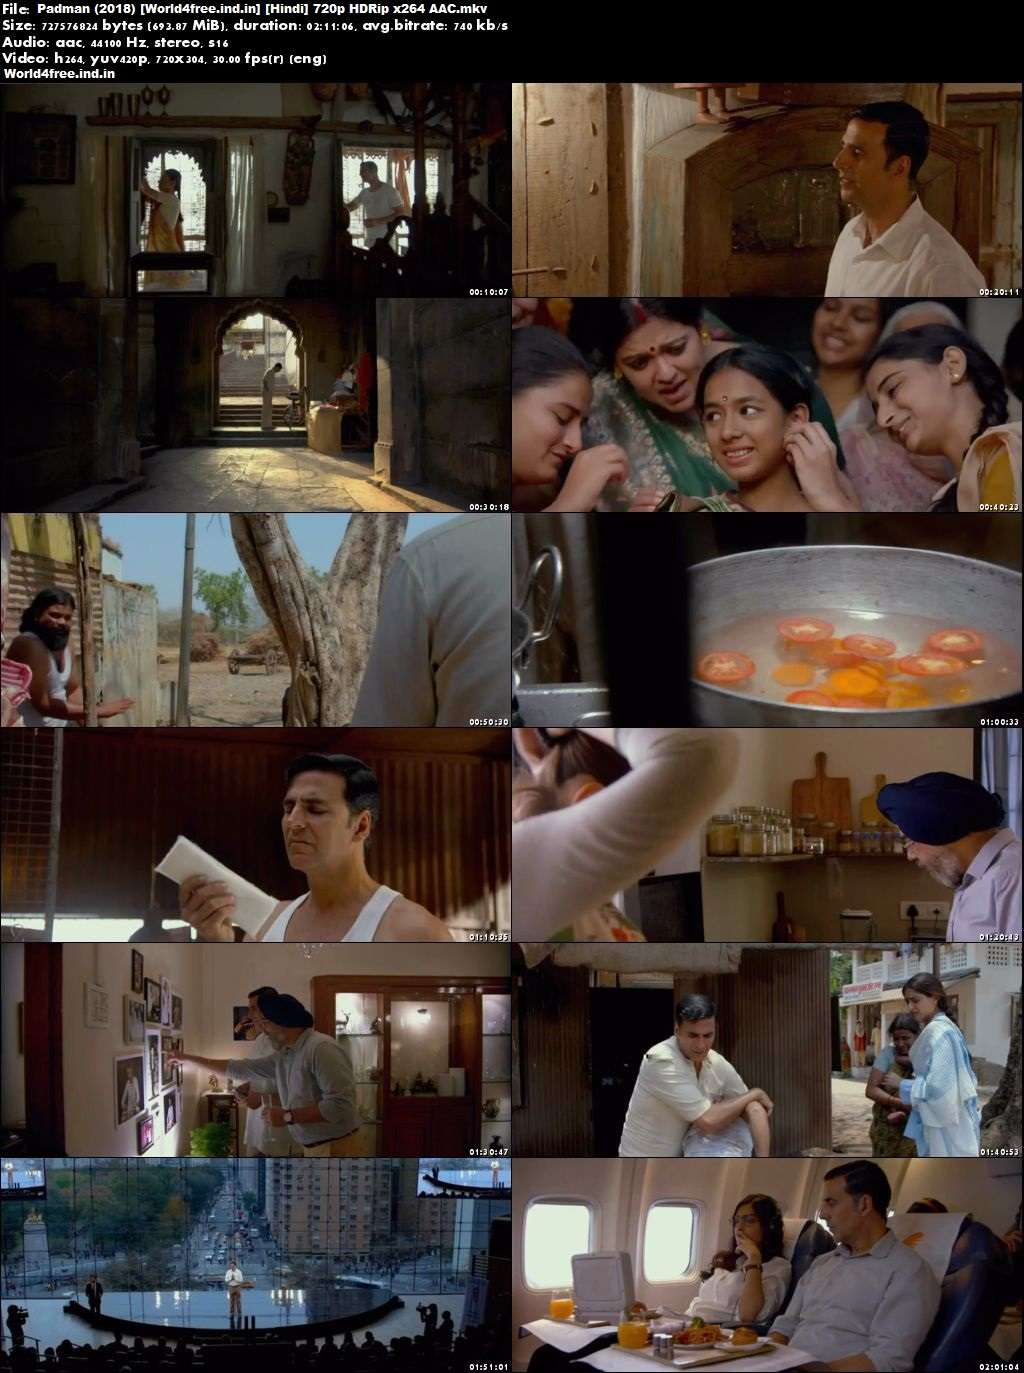 Padman 2018 worldfree4u Full Hindi Movie Download HD 720p